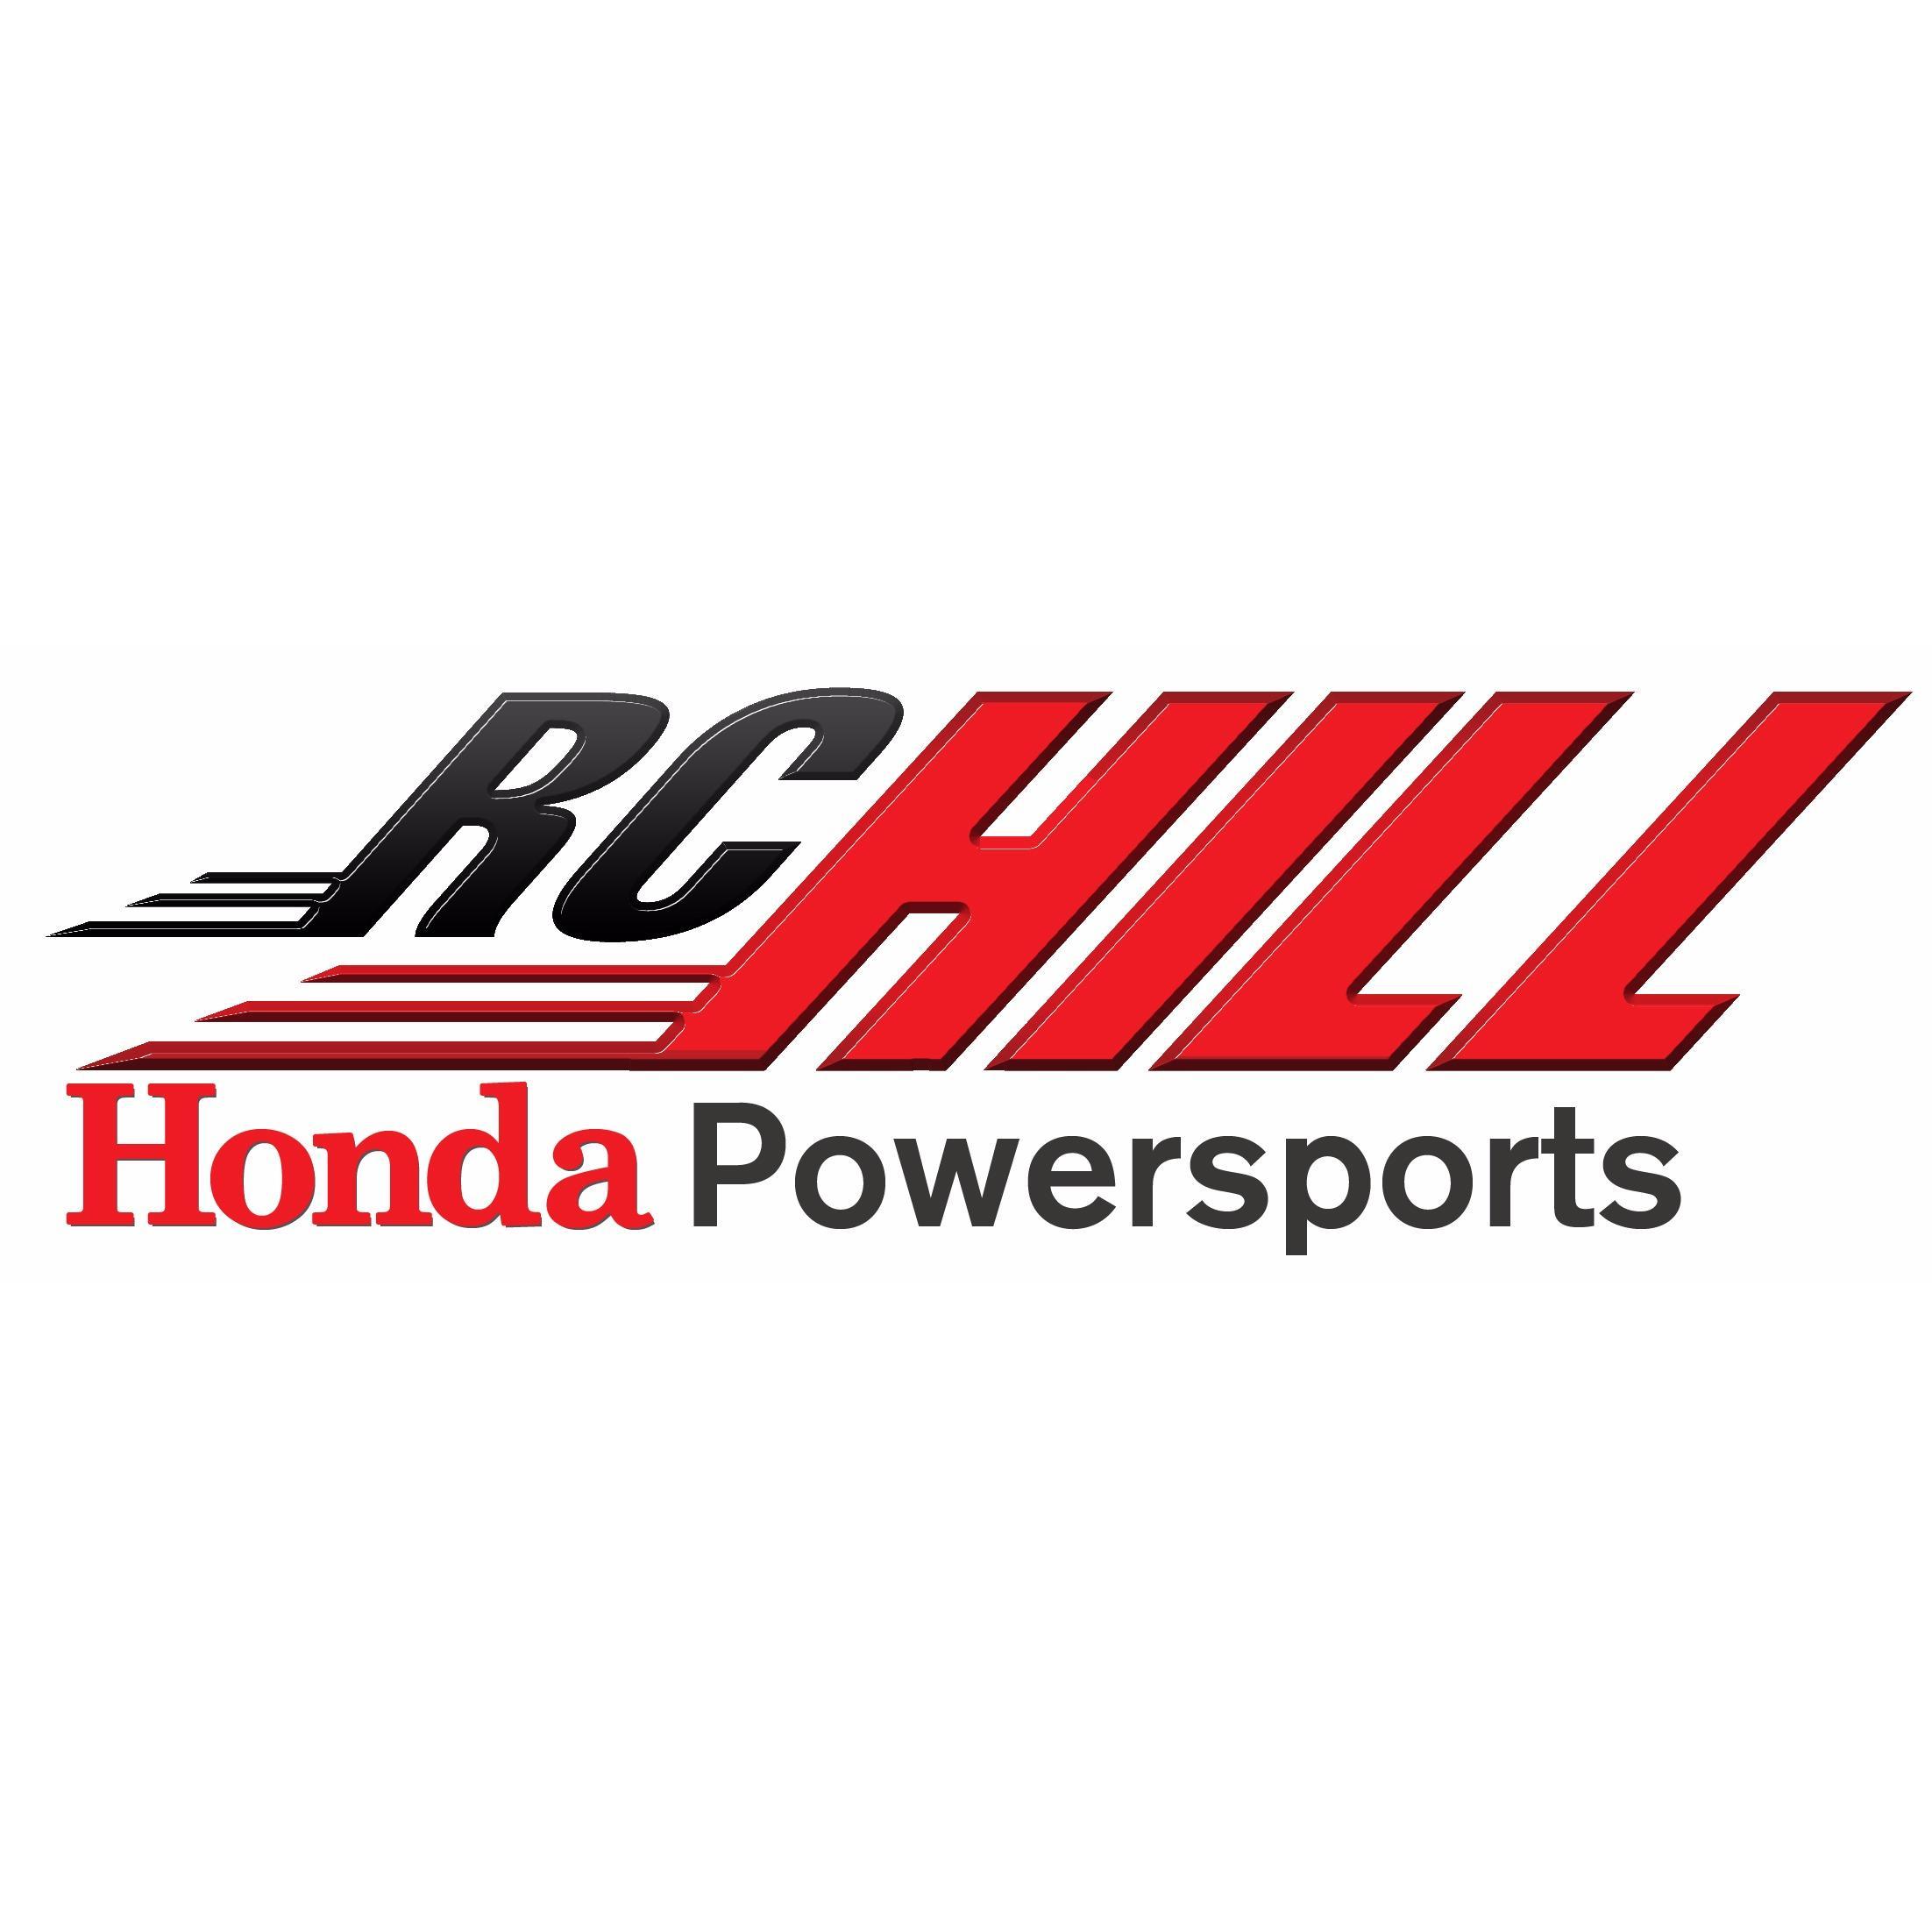 RC Hill Honda Powersports image 2